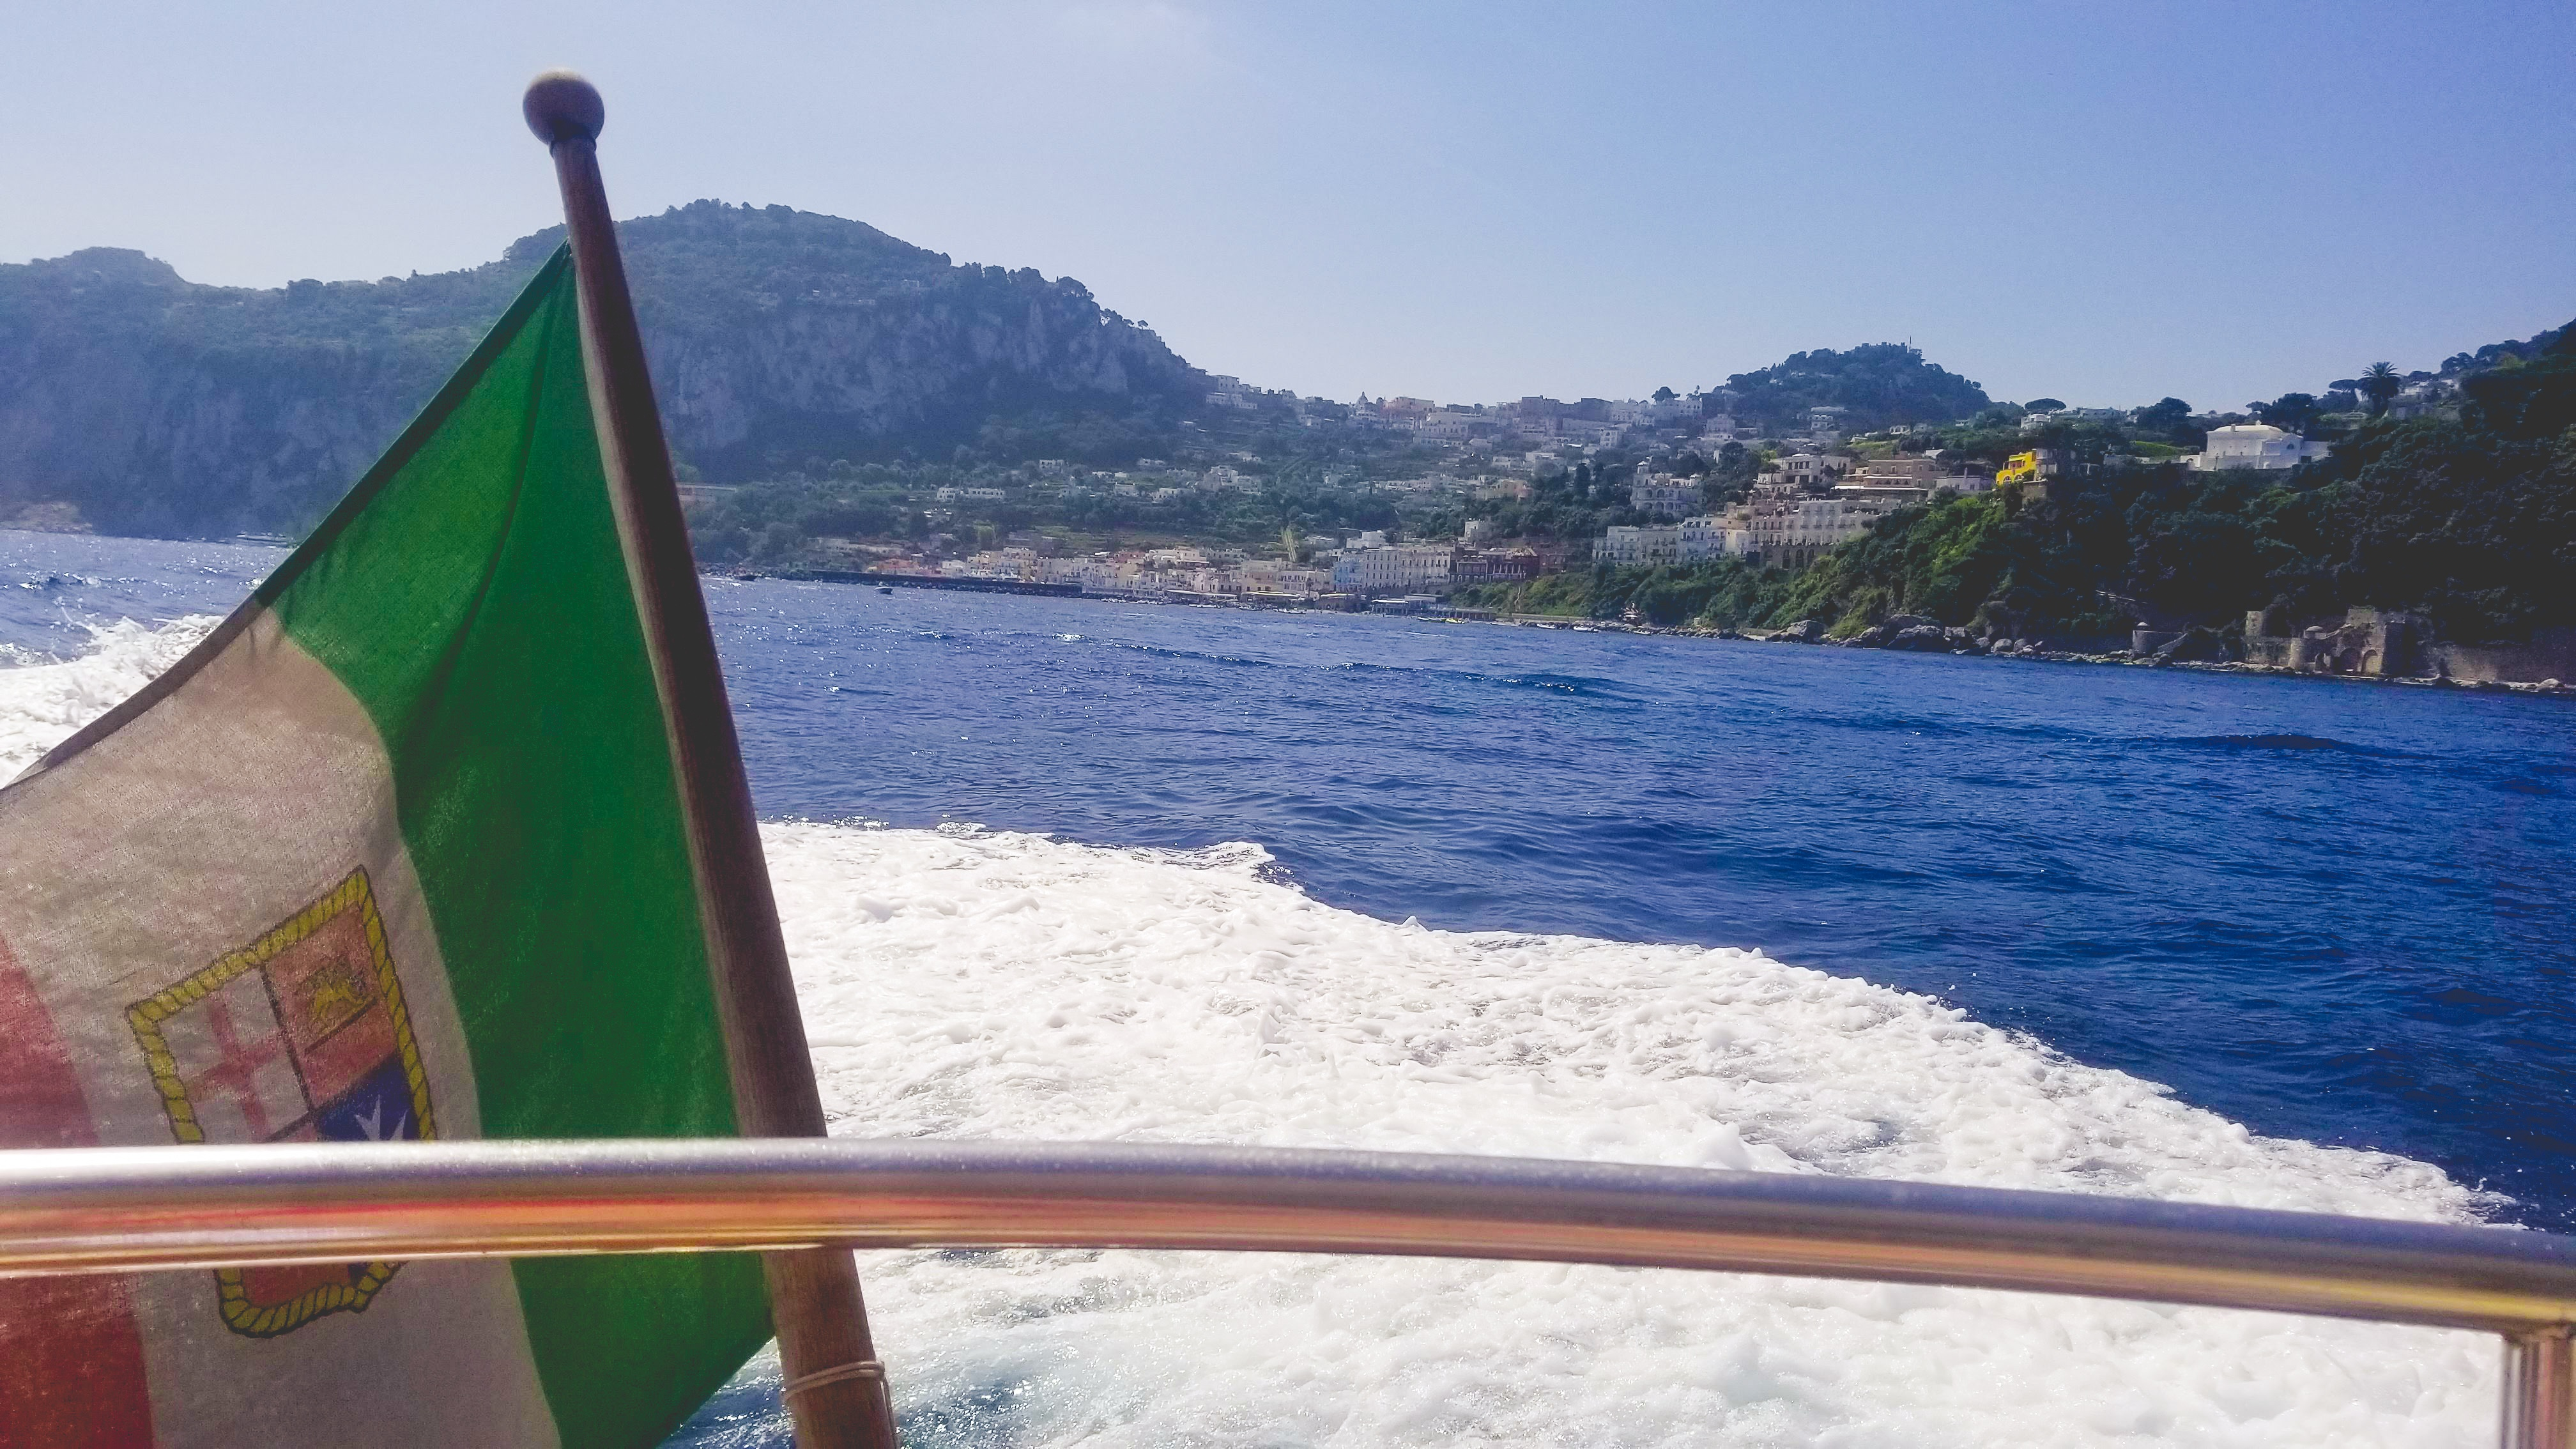 On a Boating Adventure in Capri